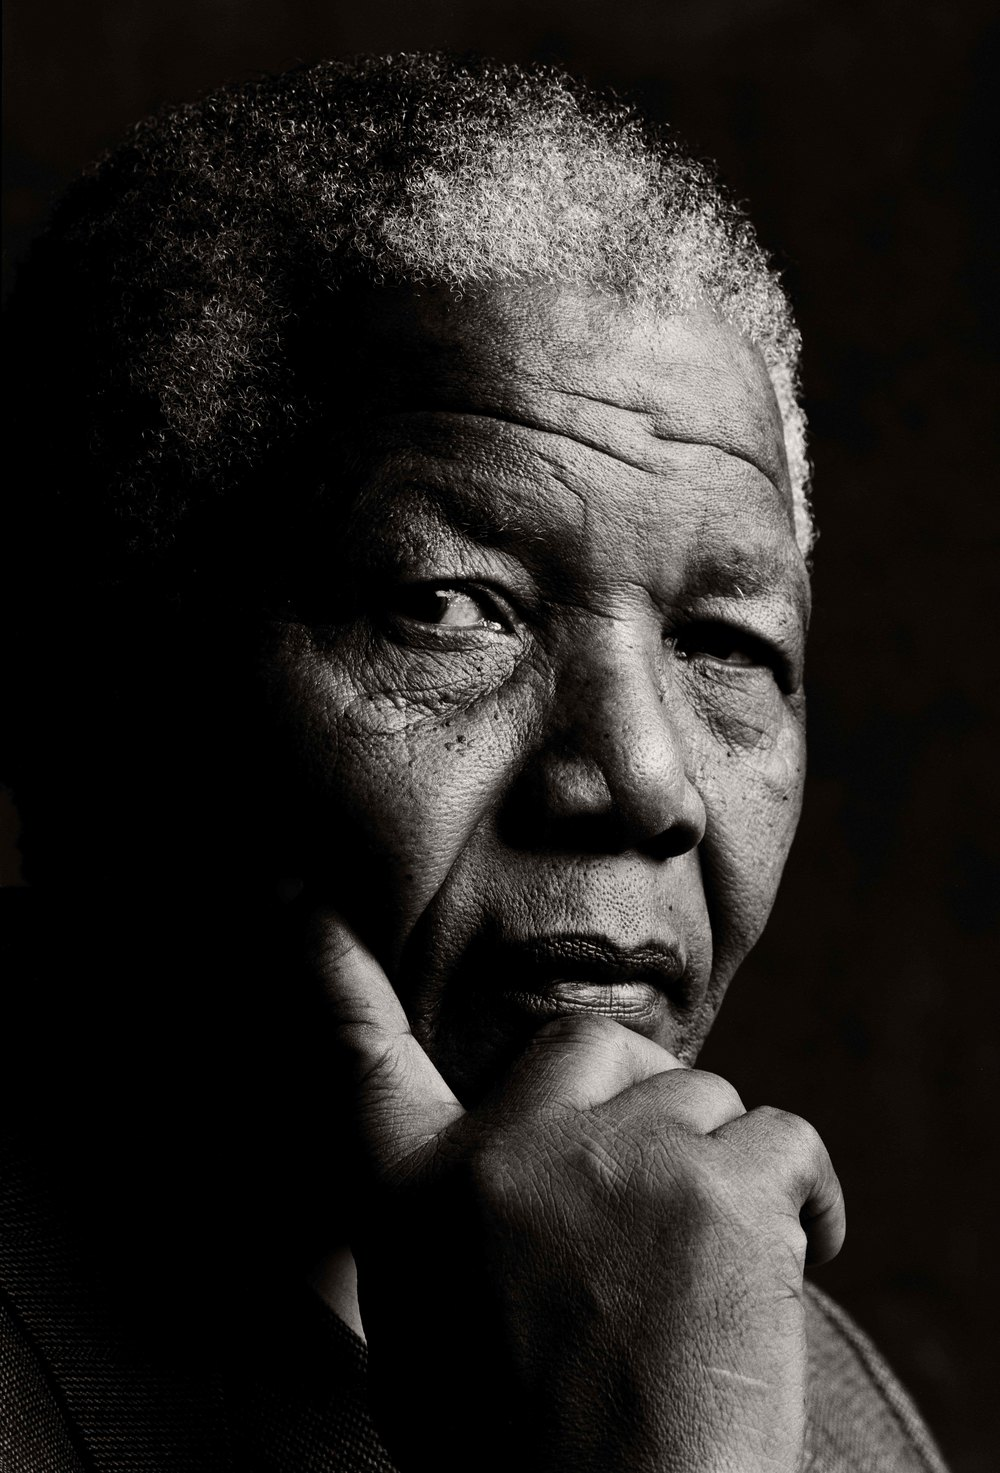 Nelson Mandela «The last real hero» 1992 1,18 x1,62 m Print Photo Canvas Ultra Glossy NOK 60 000